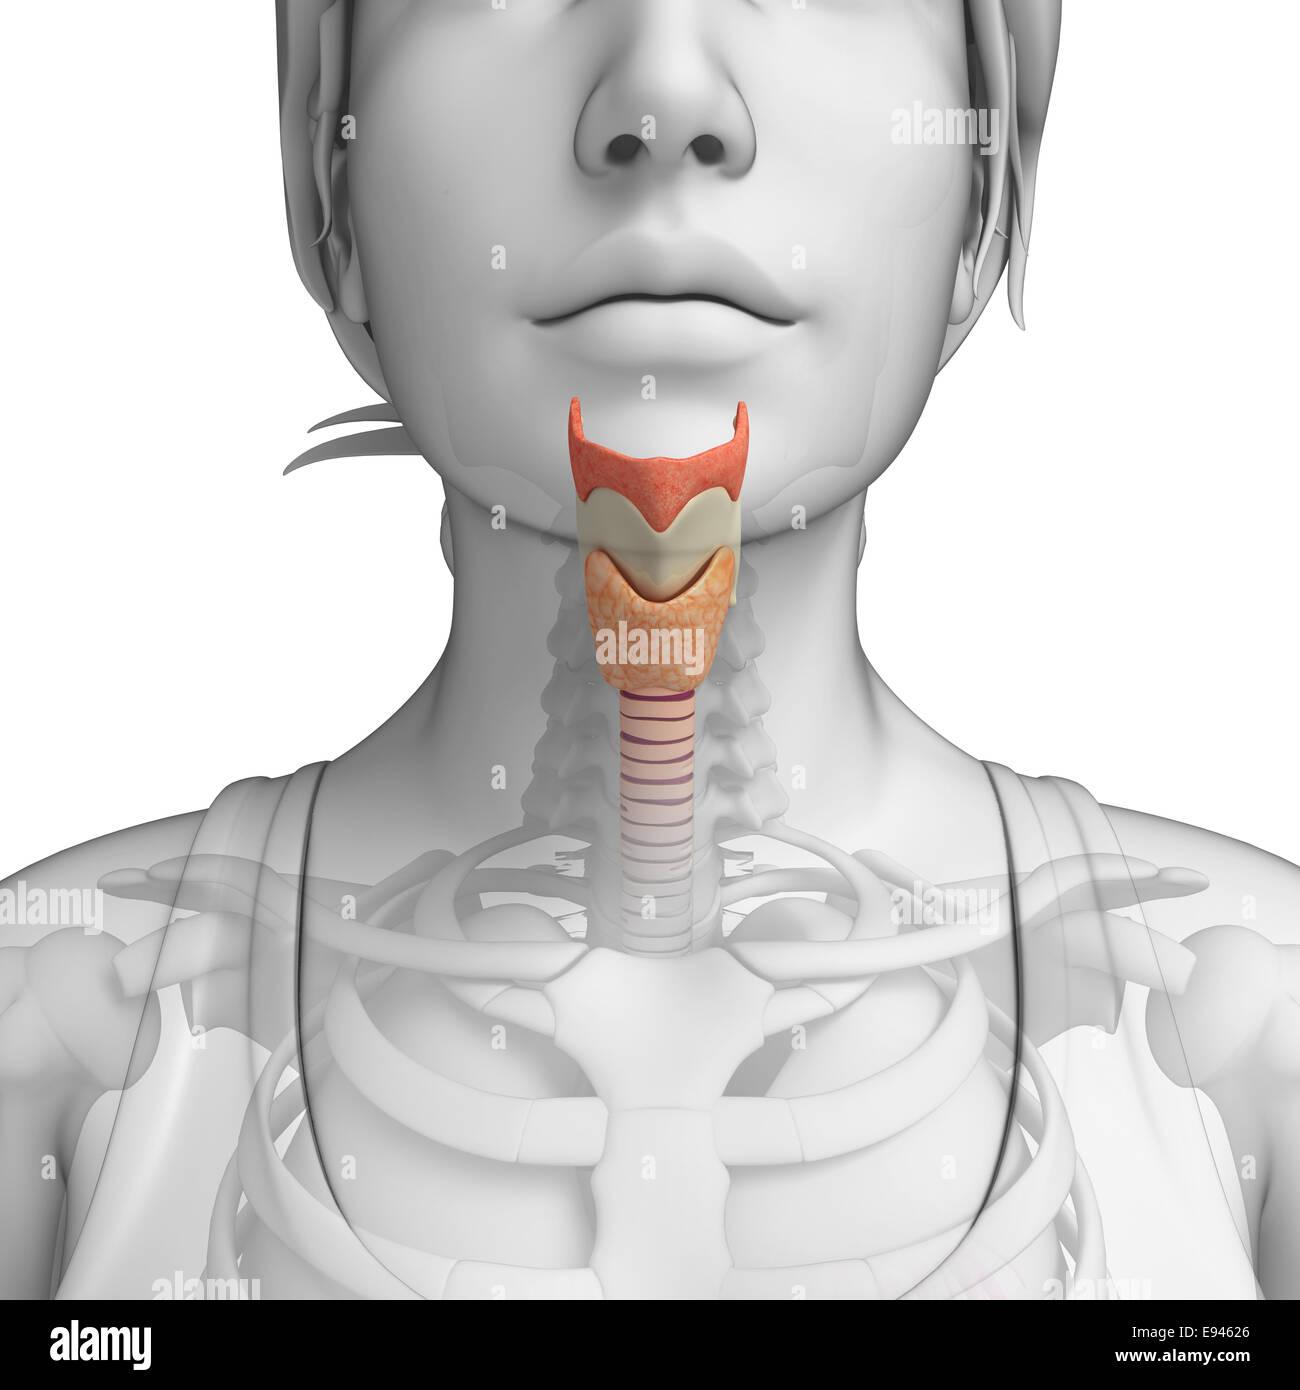 Illustration of Female throat anatomy Stock Photo: 74465950 - Alamy